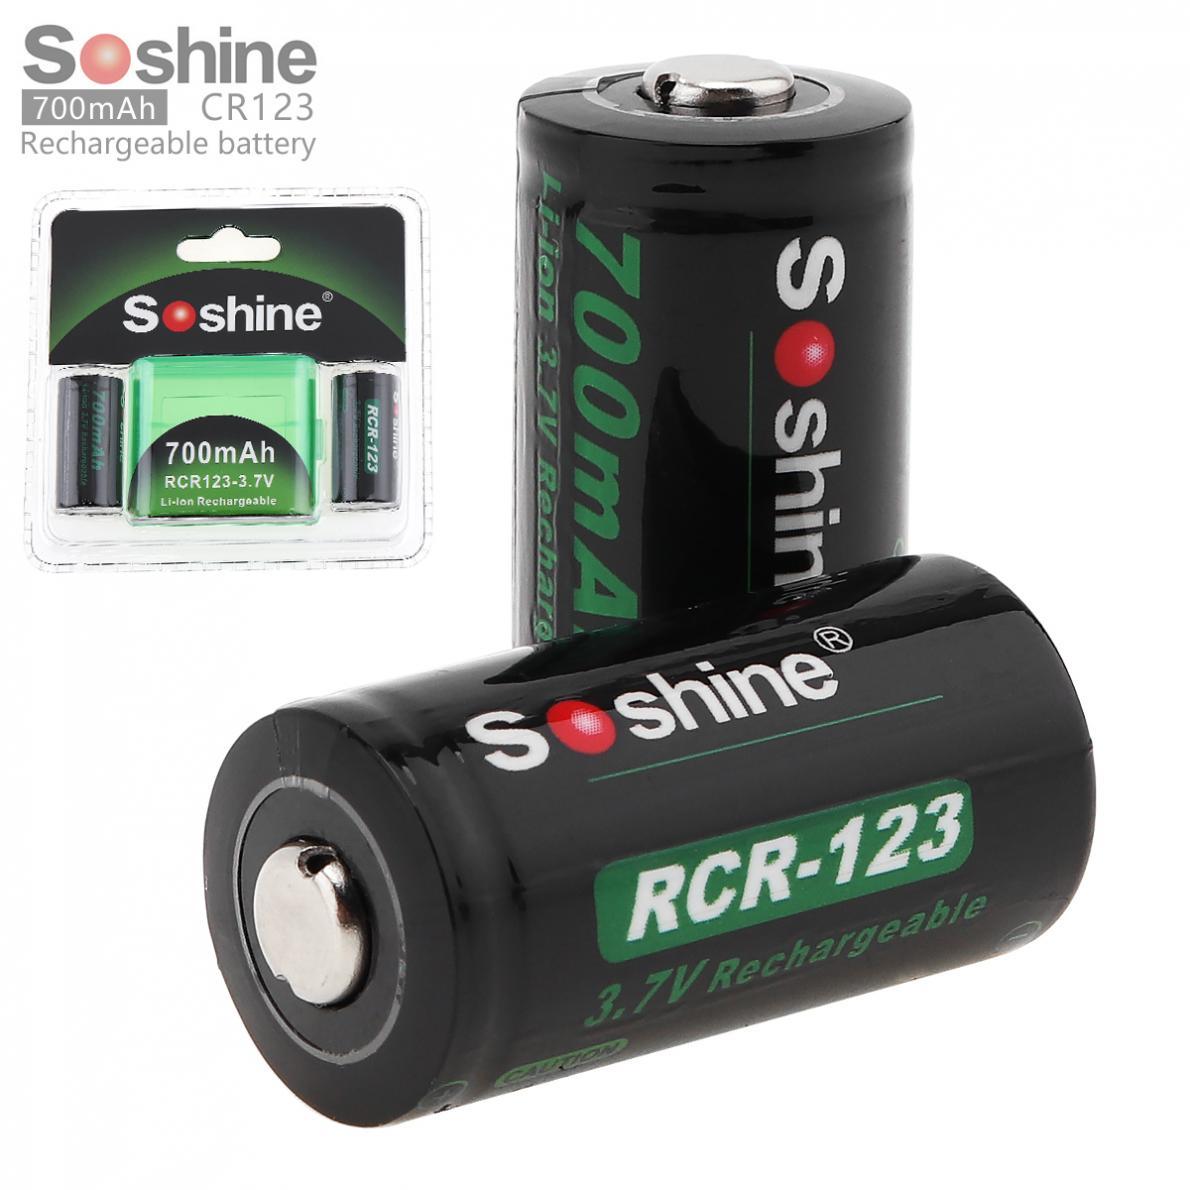 4 Pieces/set Soshine Li-ion RCR 123 16340 700mAh 3.7V Rechargeable Lithium Li-ion battria+2 Battery Case Storage Box portable rechargeable 700mah li ion battery for nintendo nds black